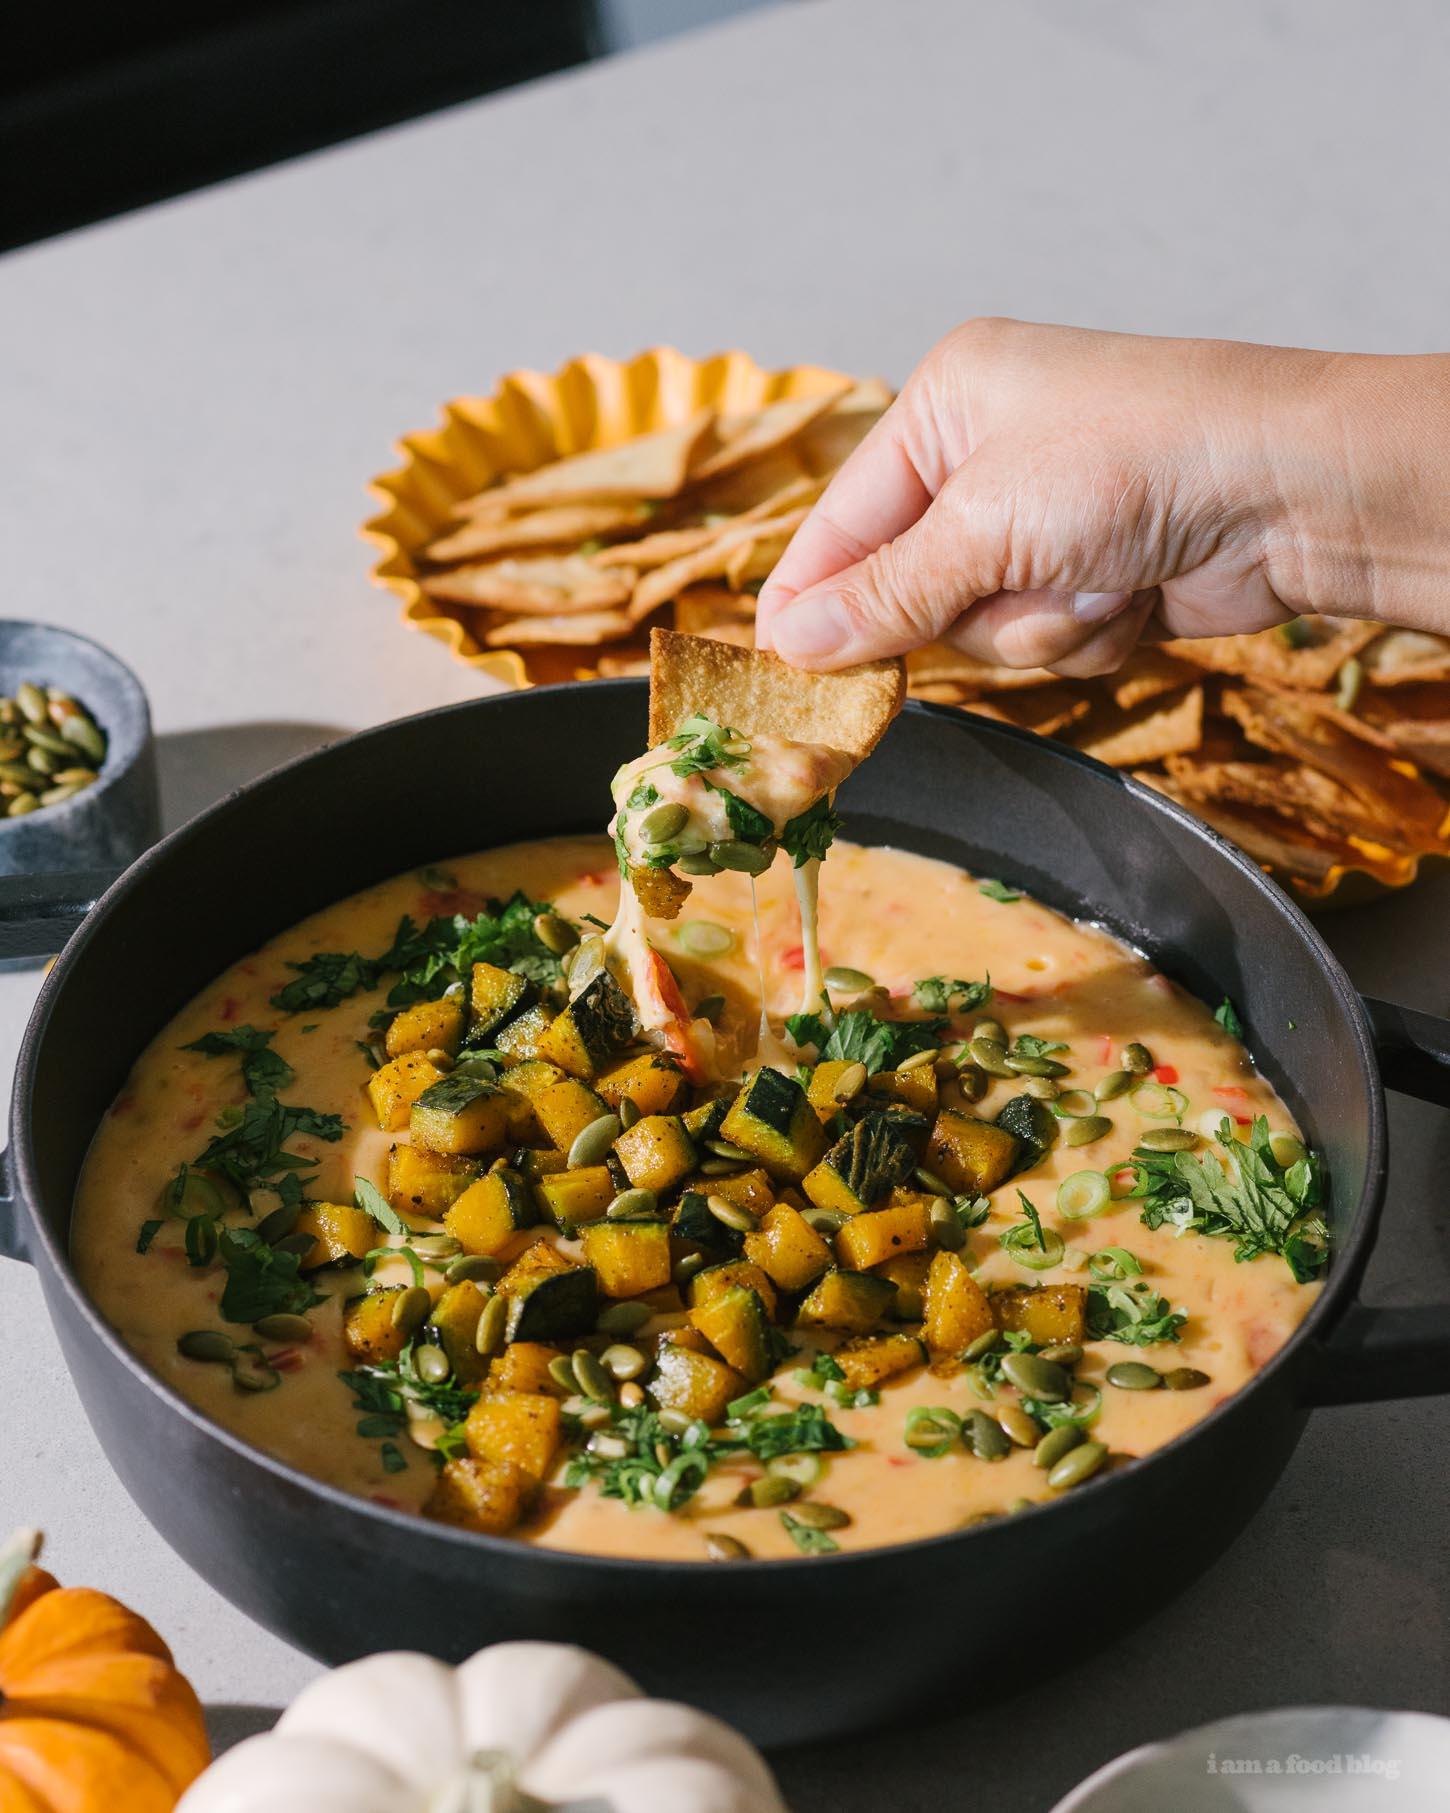 Pumpkin Queso Recipe | www.iamafoodblog.com